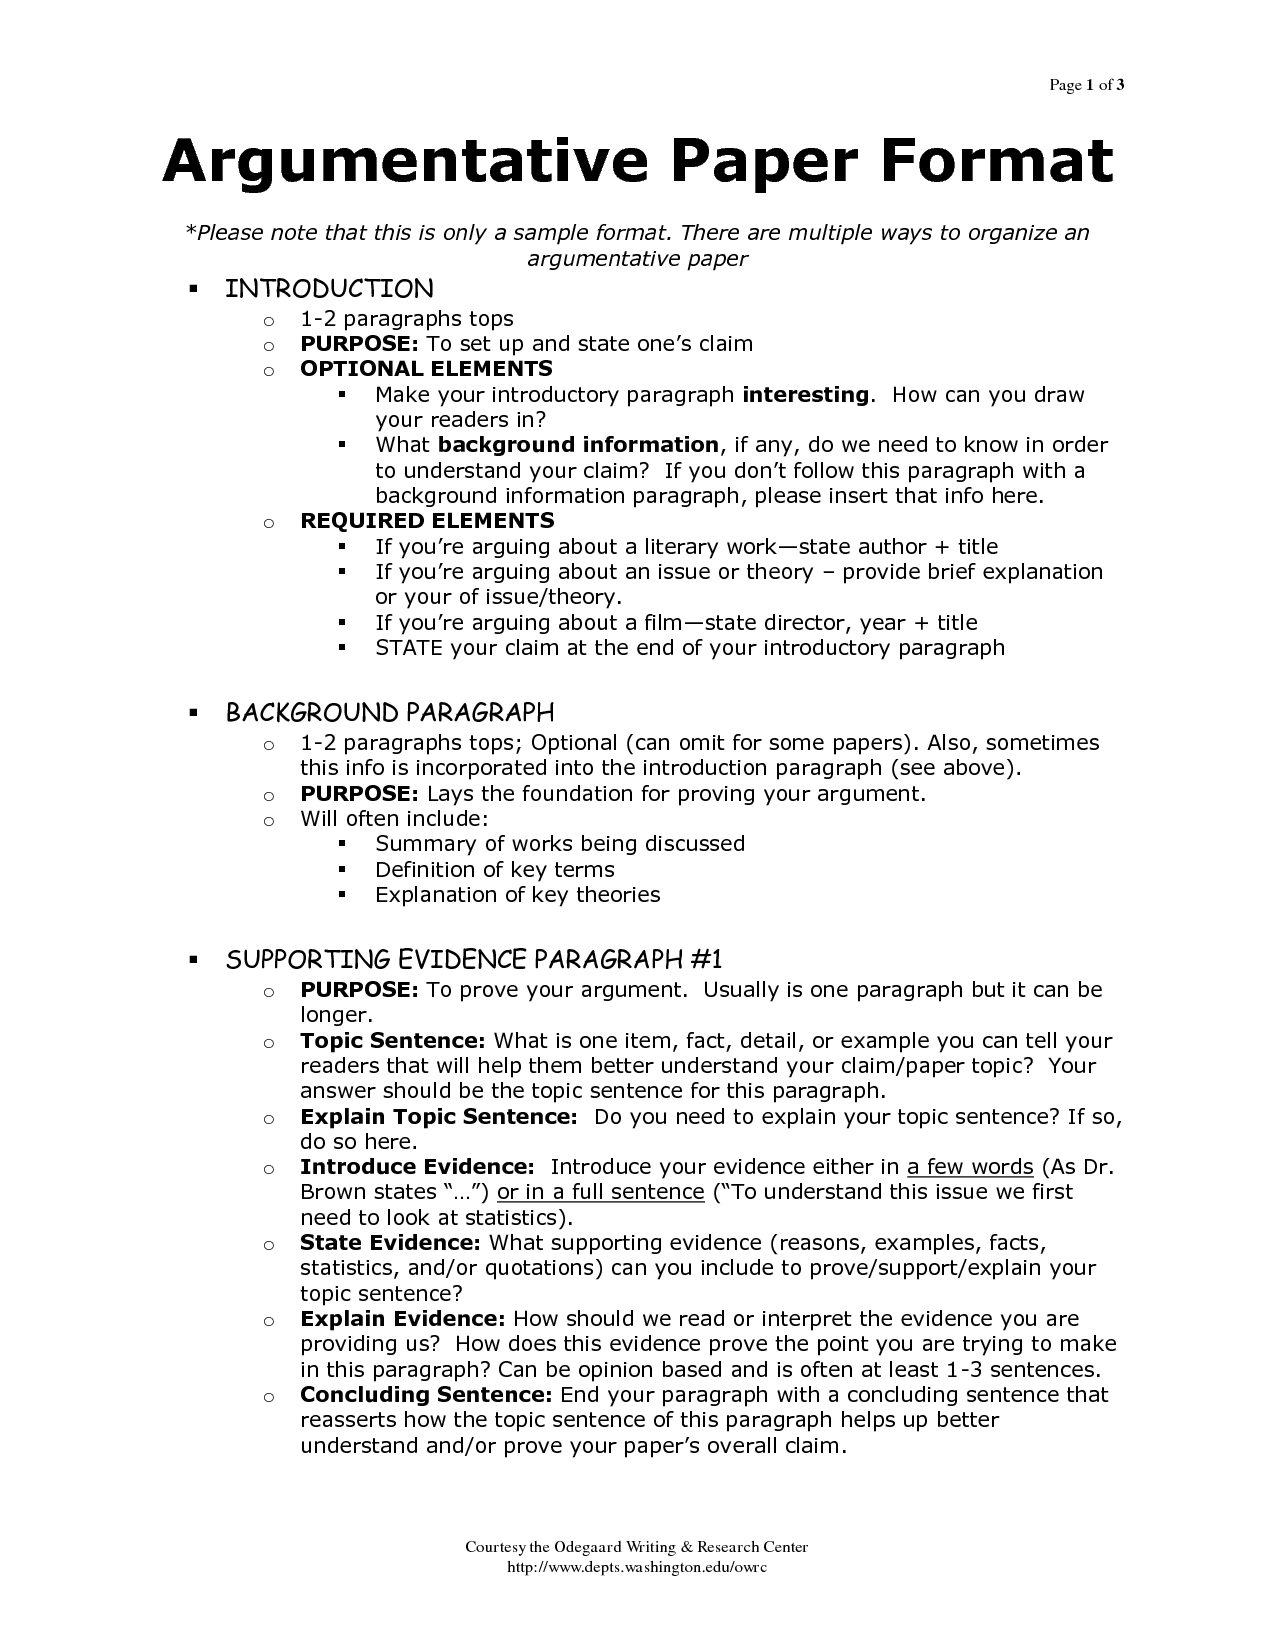 003 Nj9s0dardu Argumentative Research Essay Phenomenal Example Structure Medical Topics Full